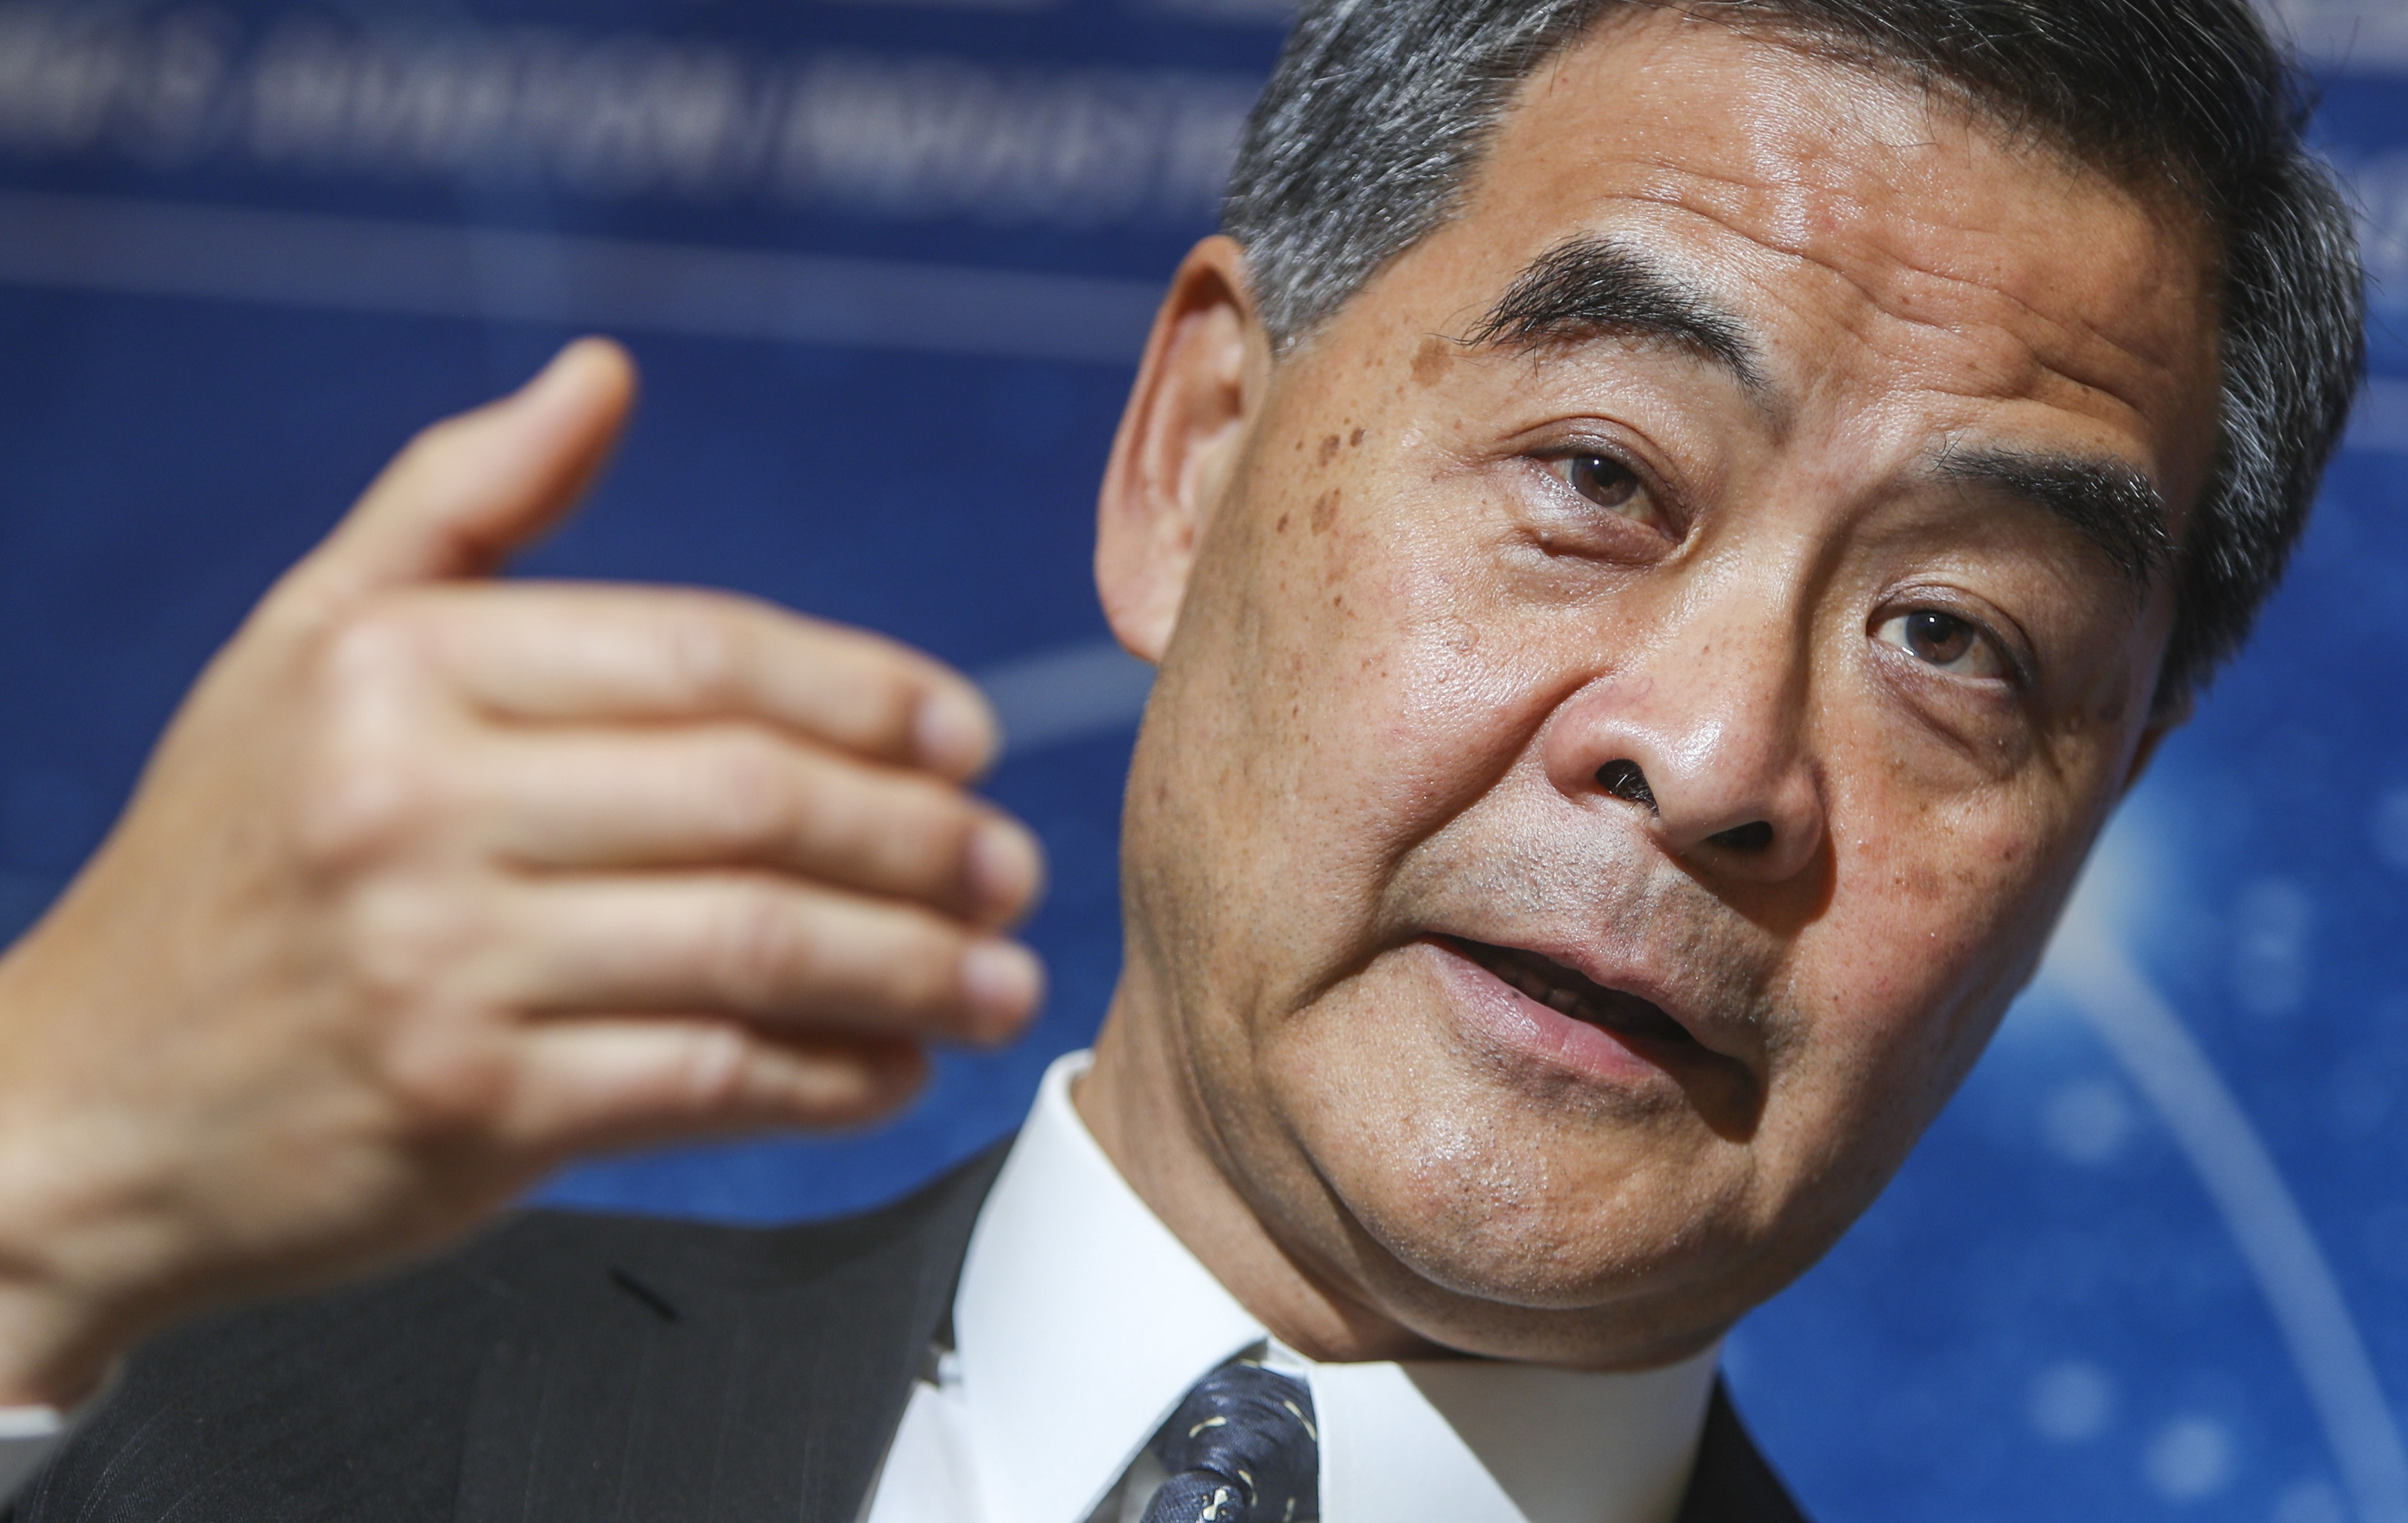 Former Hong Kong leader Leung Chun-ying calls for boycott of